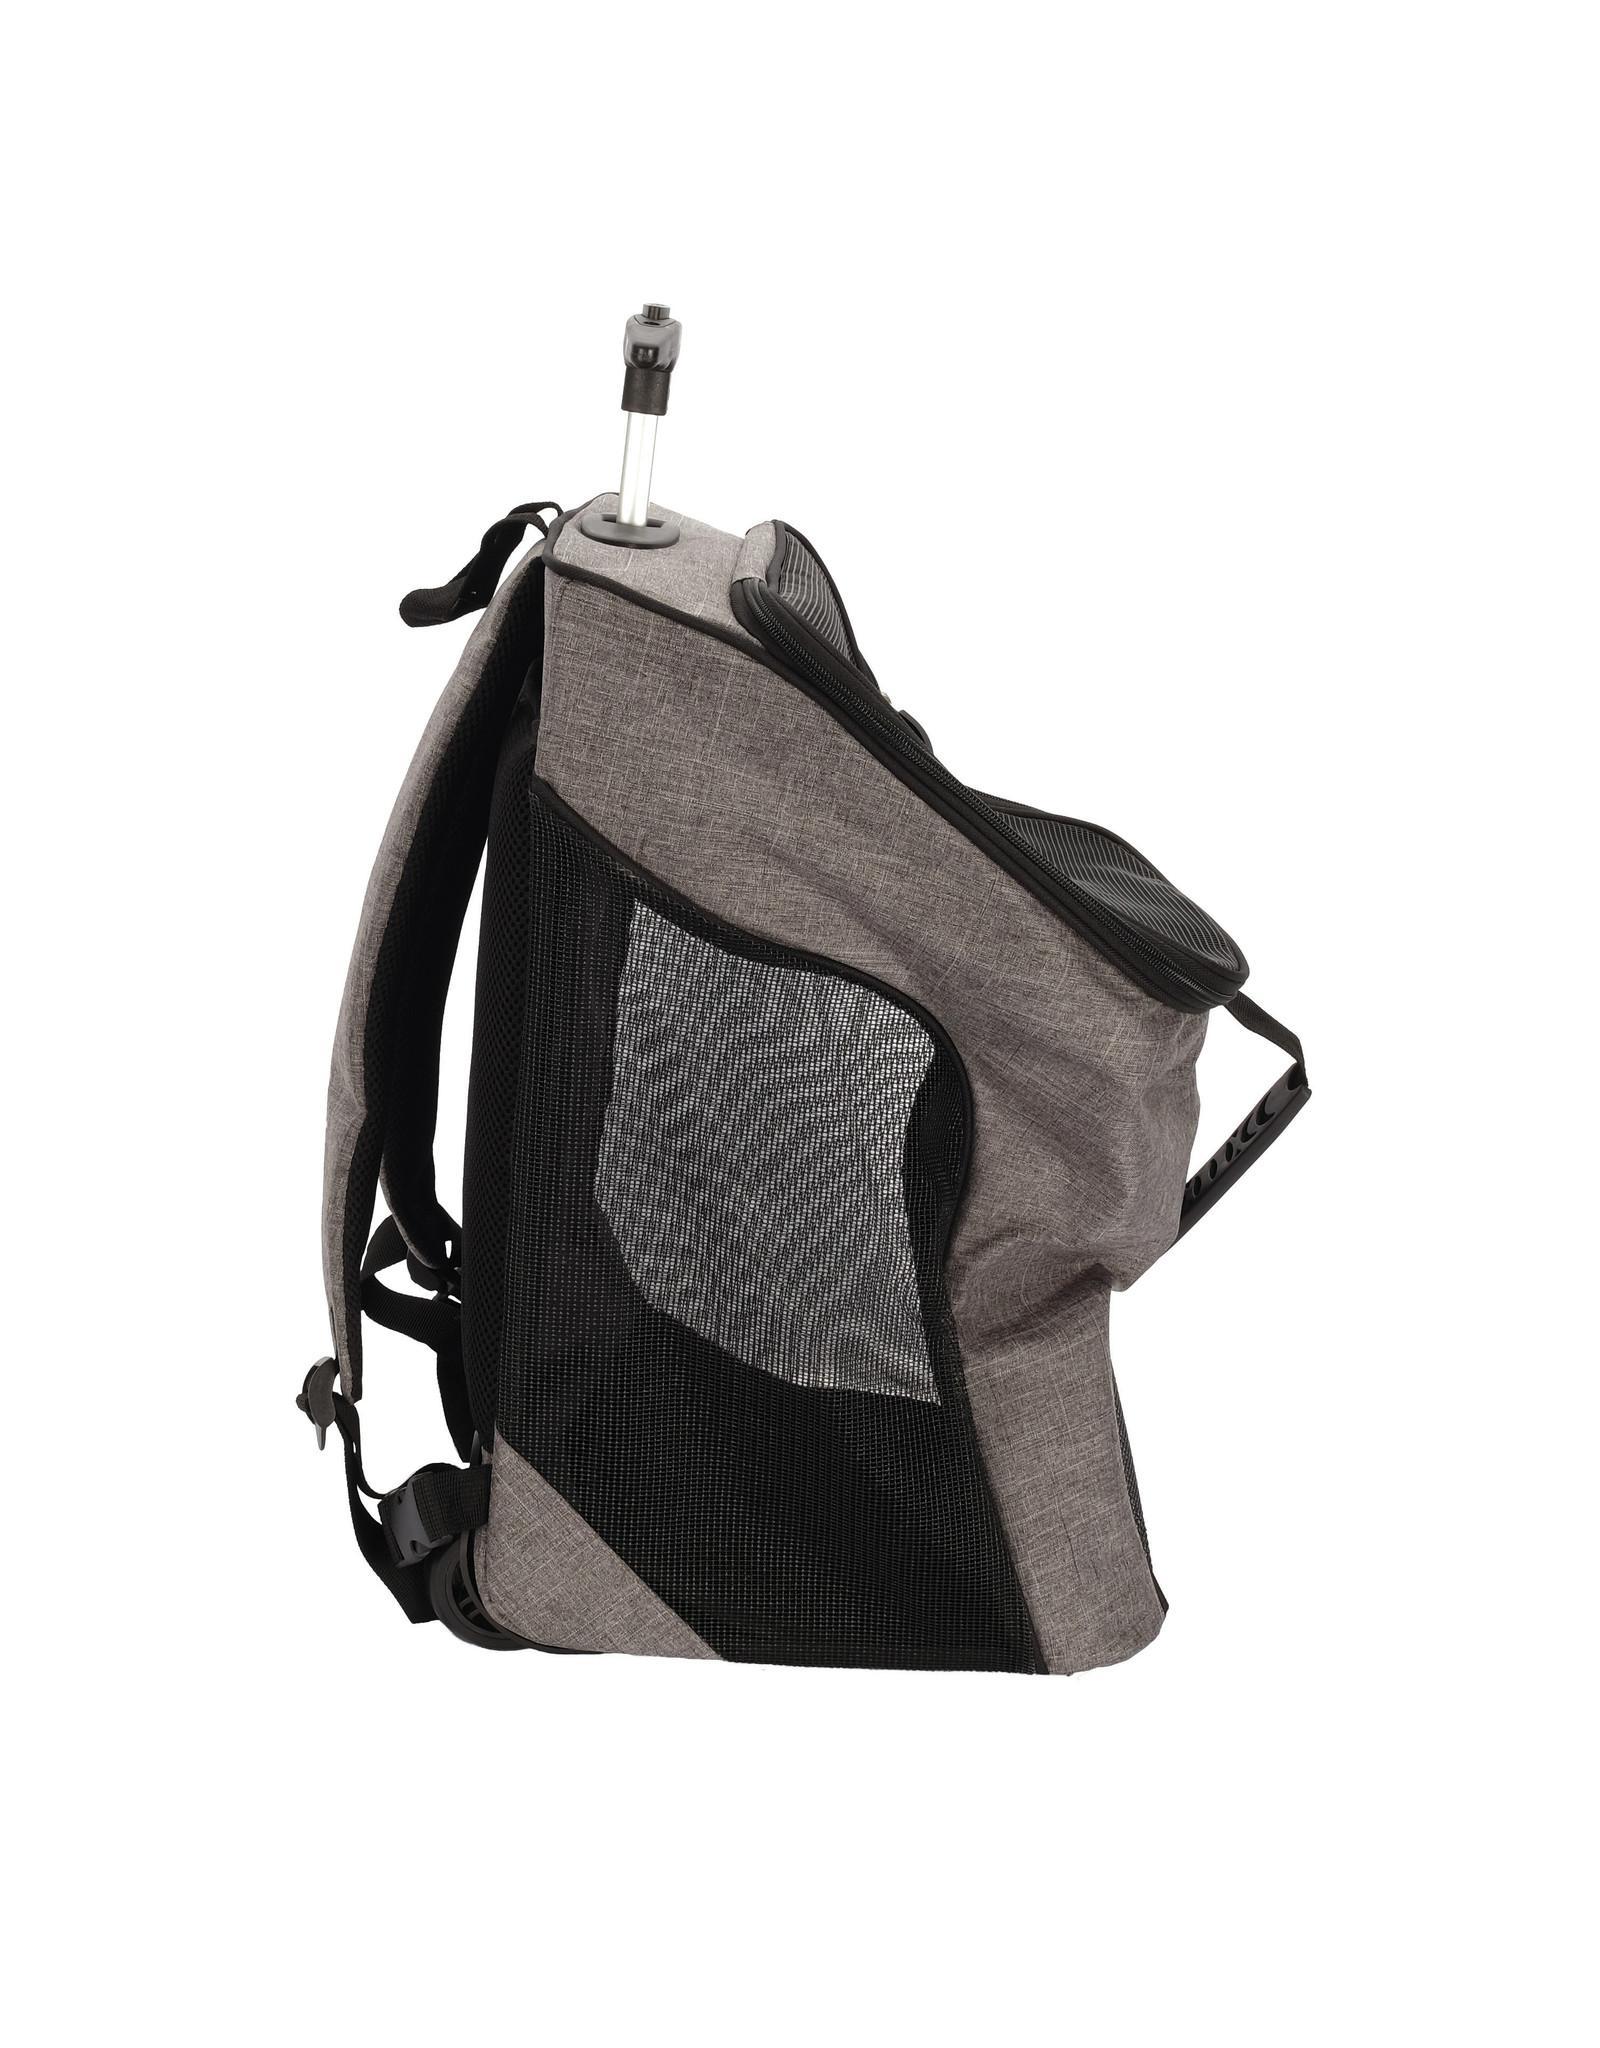 DO - Dogit Dogit Explorer Soft Carrier 2-in-1 Wheeled Carrier/Backpack - Gray